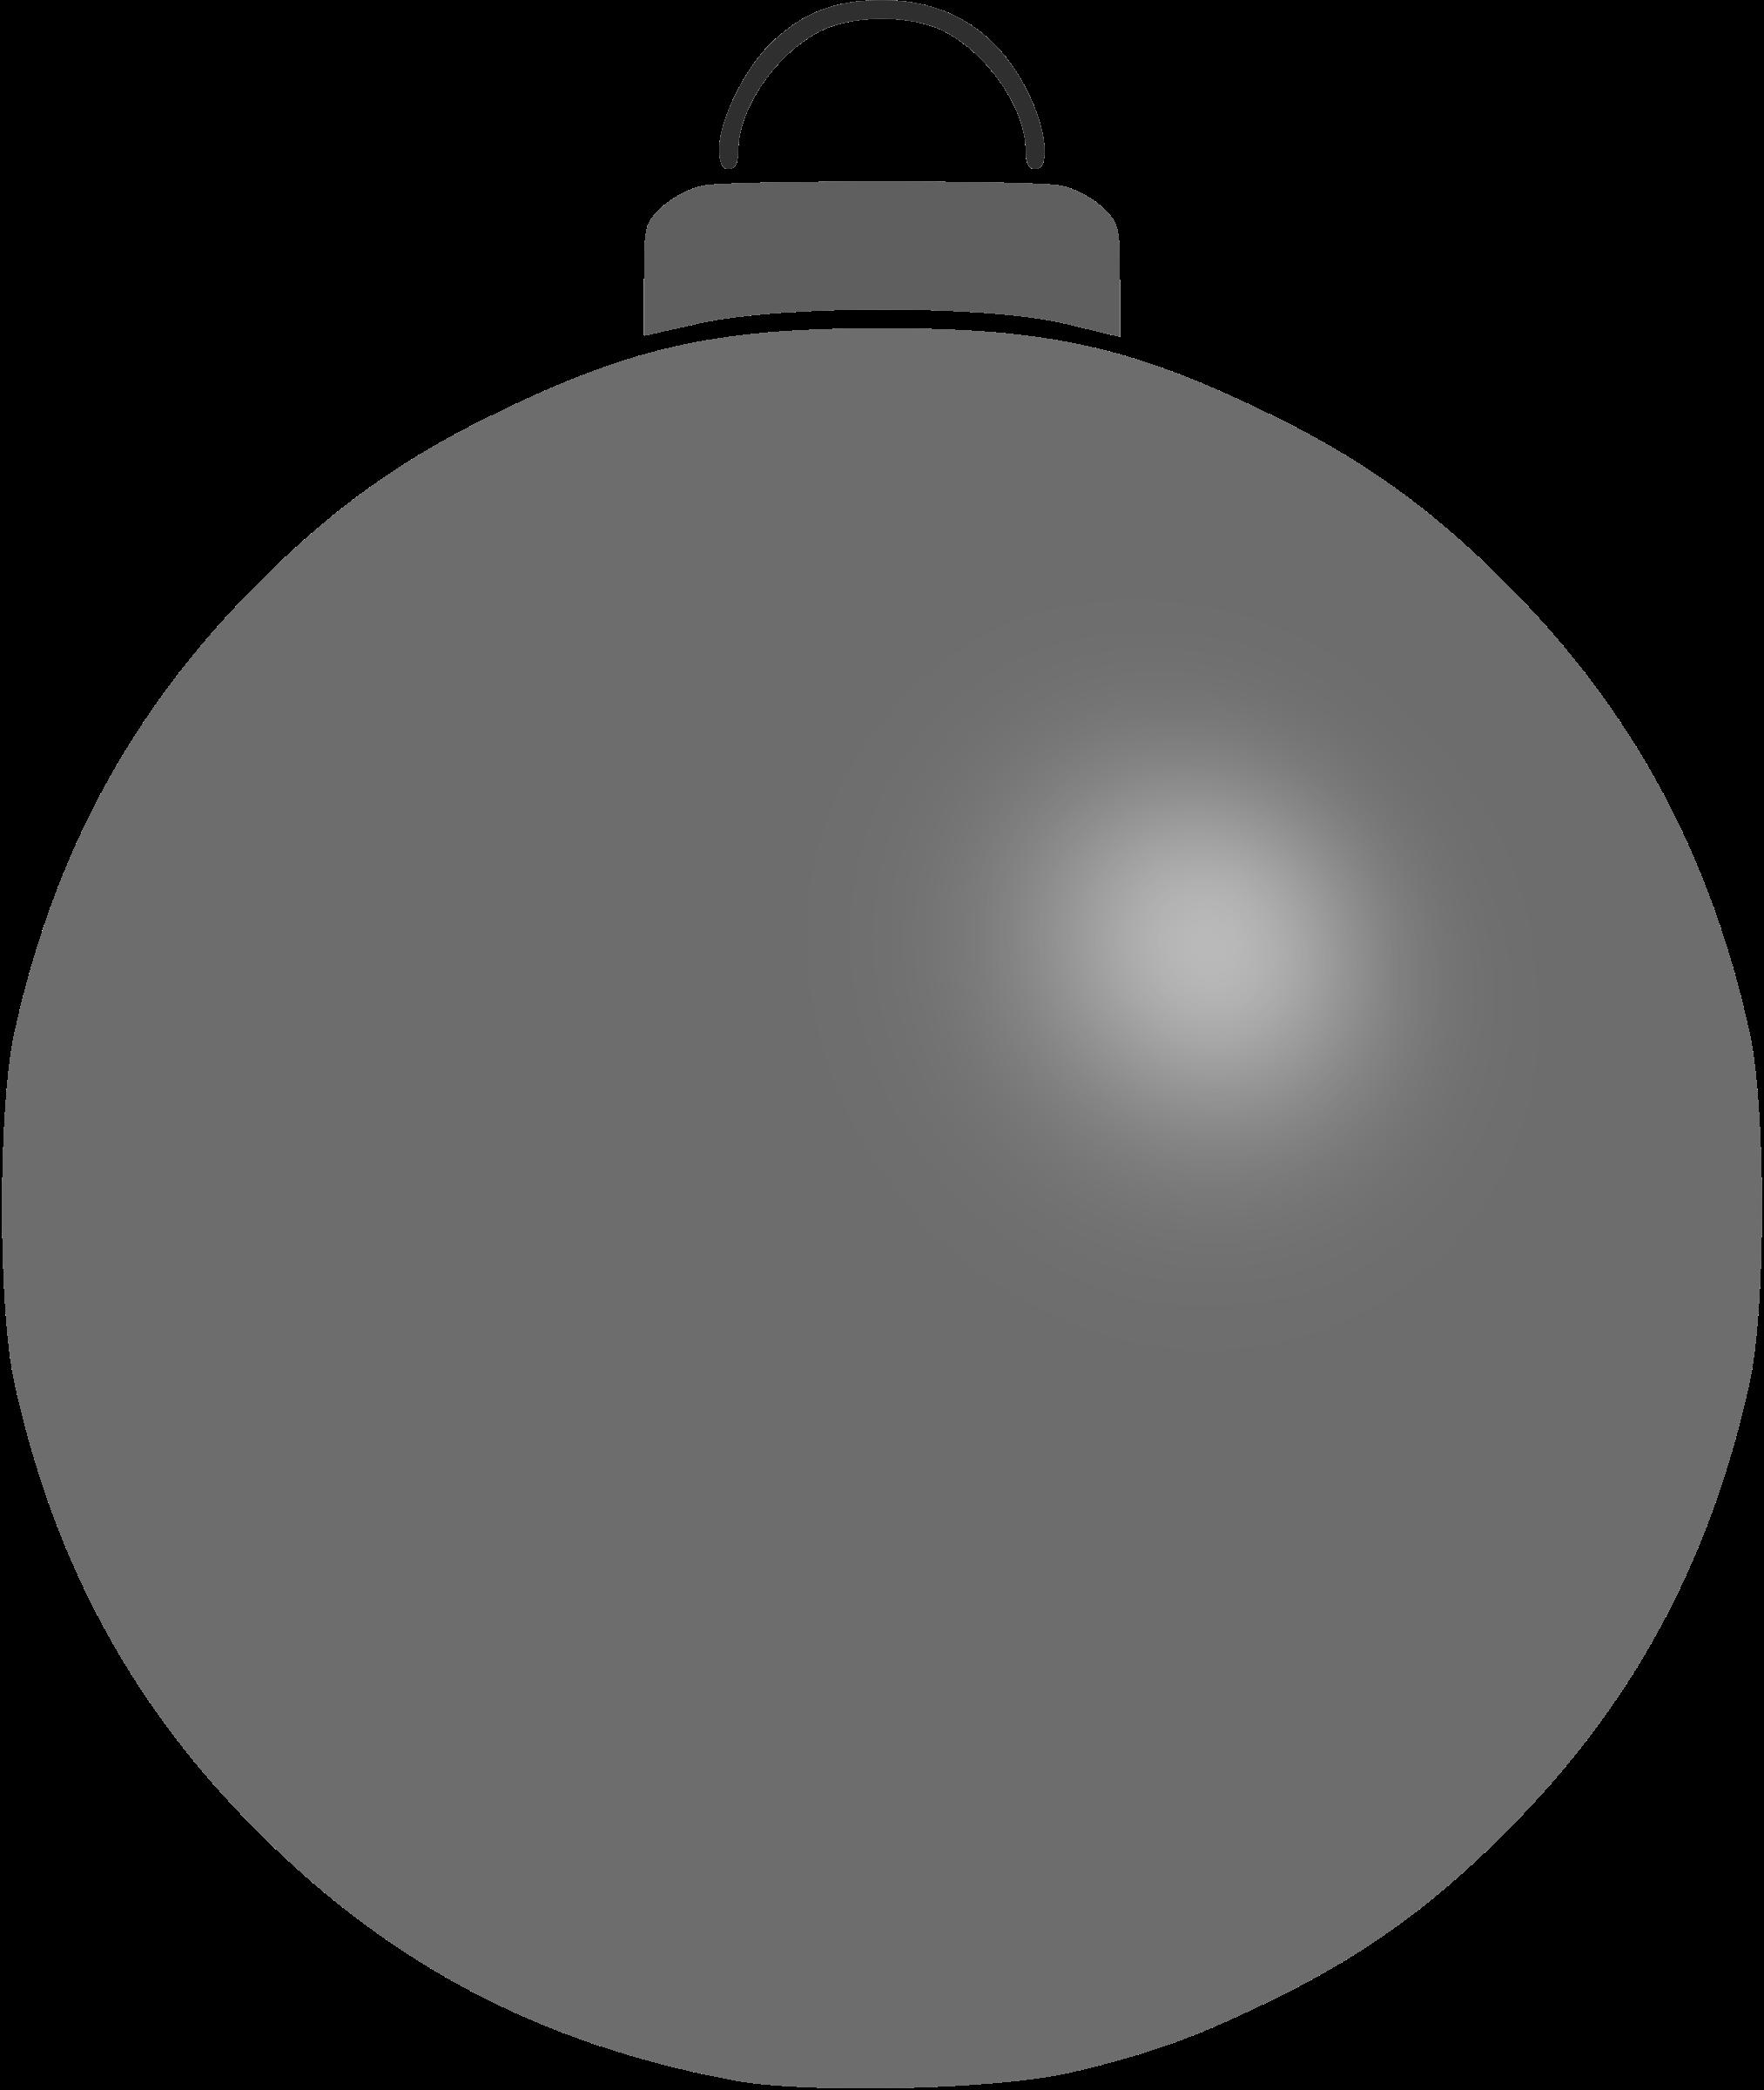 Ornament bauble